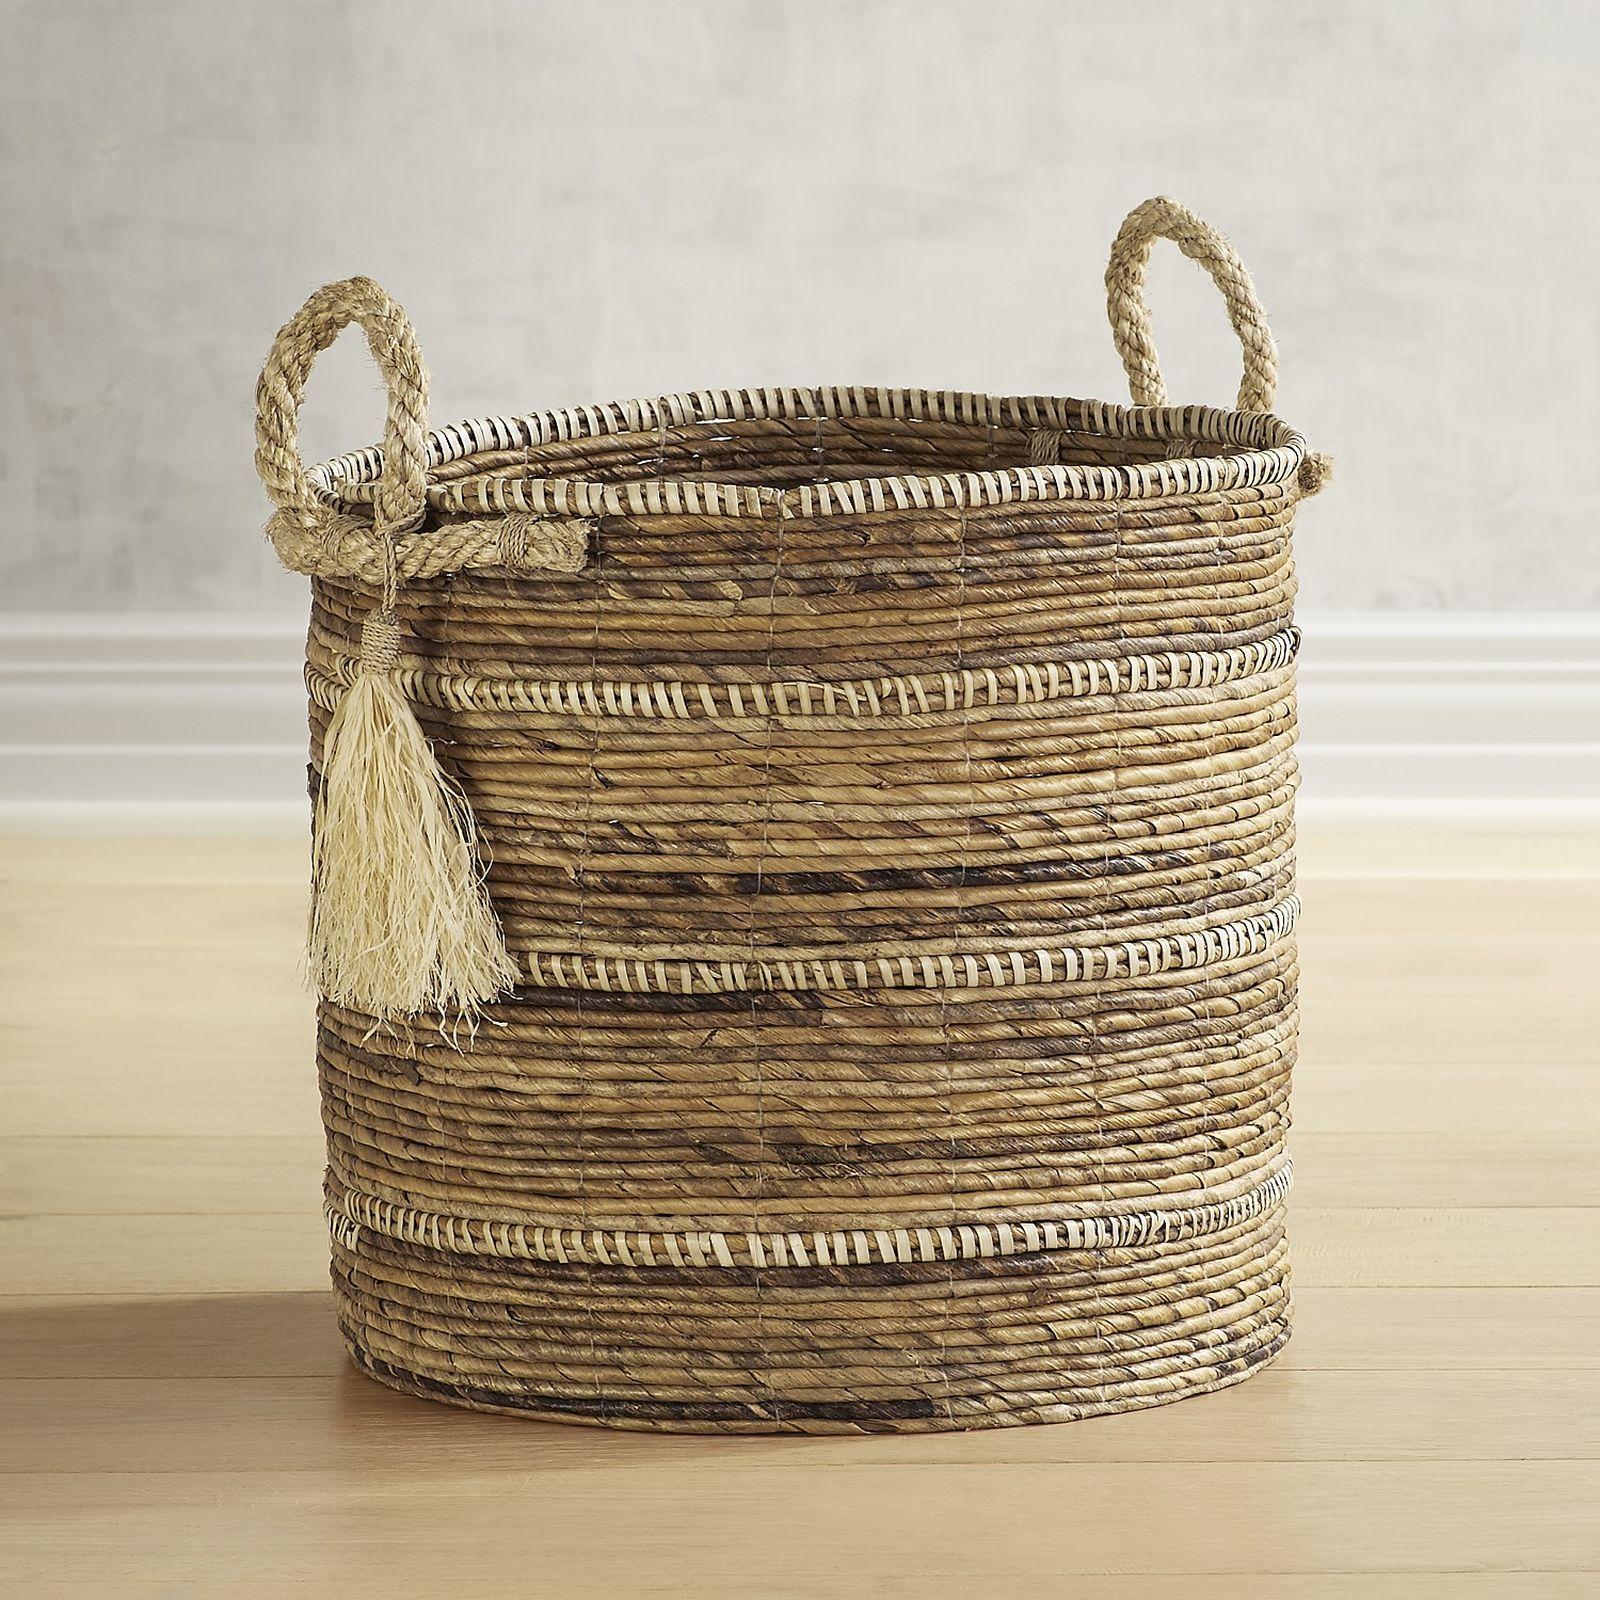 Sensational Bayard Basket Decor Accessories Accents Basket Alphanode Cool Chair Designs And Ideas Alphanodeonline